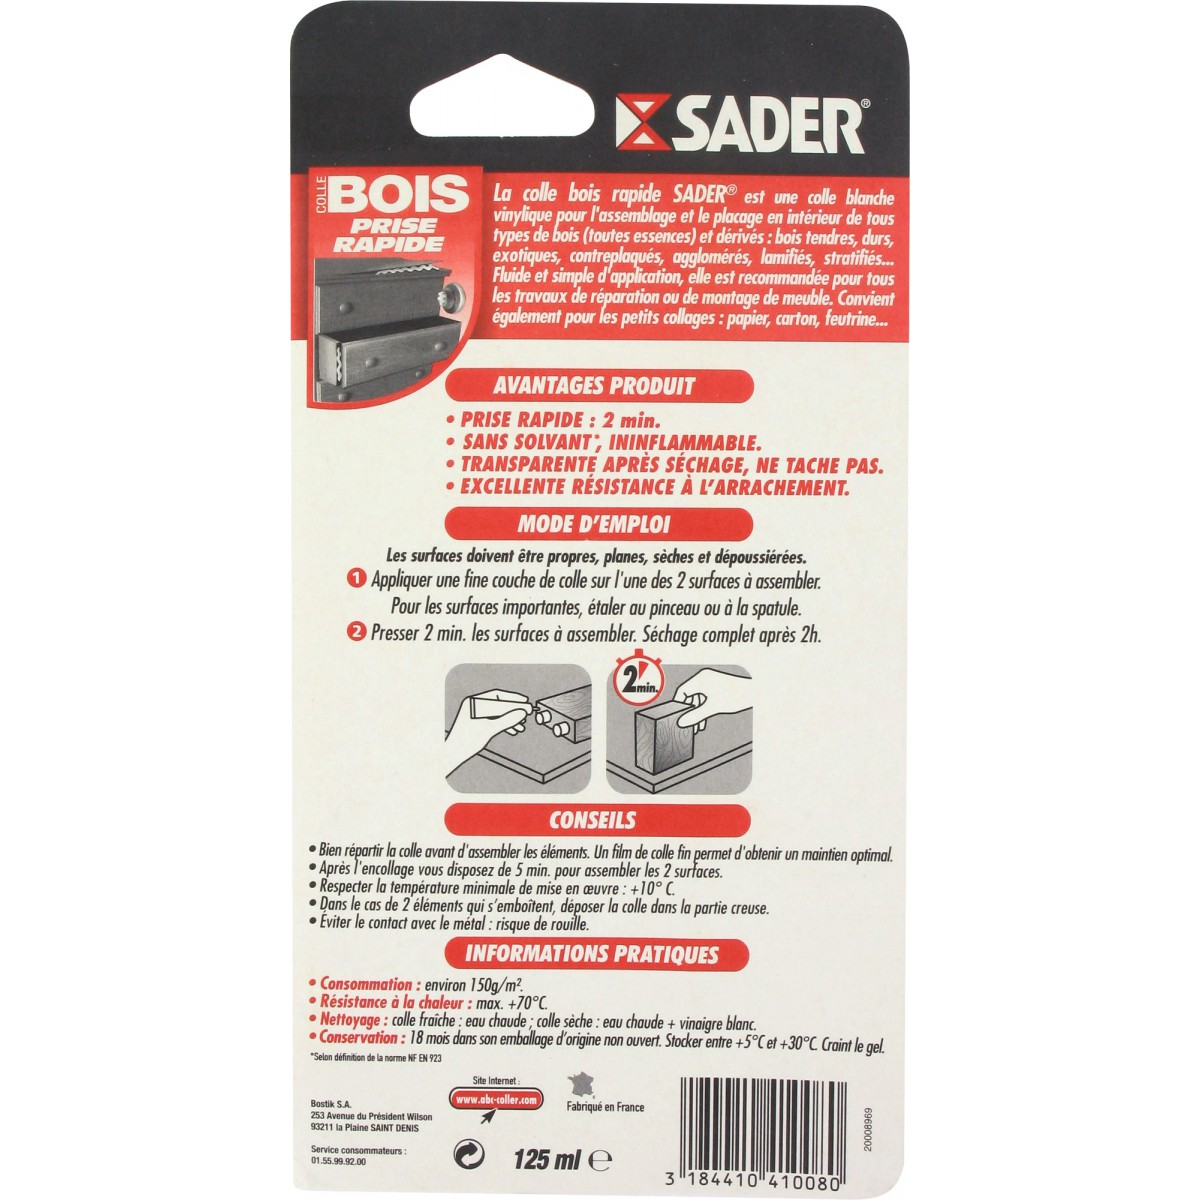 Colle à bois prise rapide Sader - Prise rapide 5 minutes - Tube 125 ml